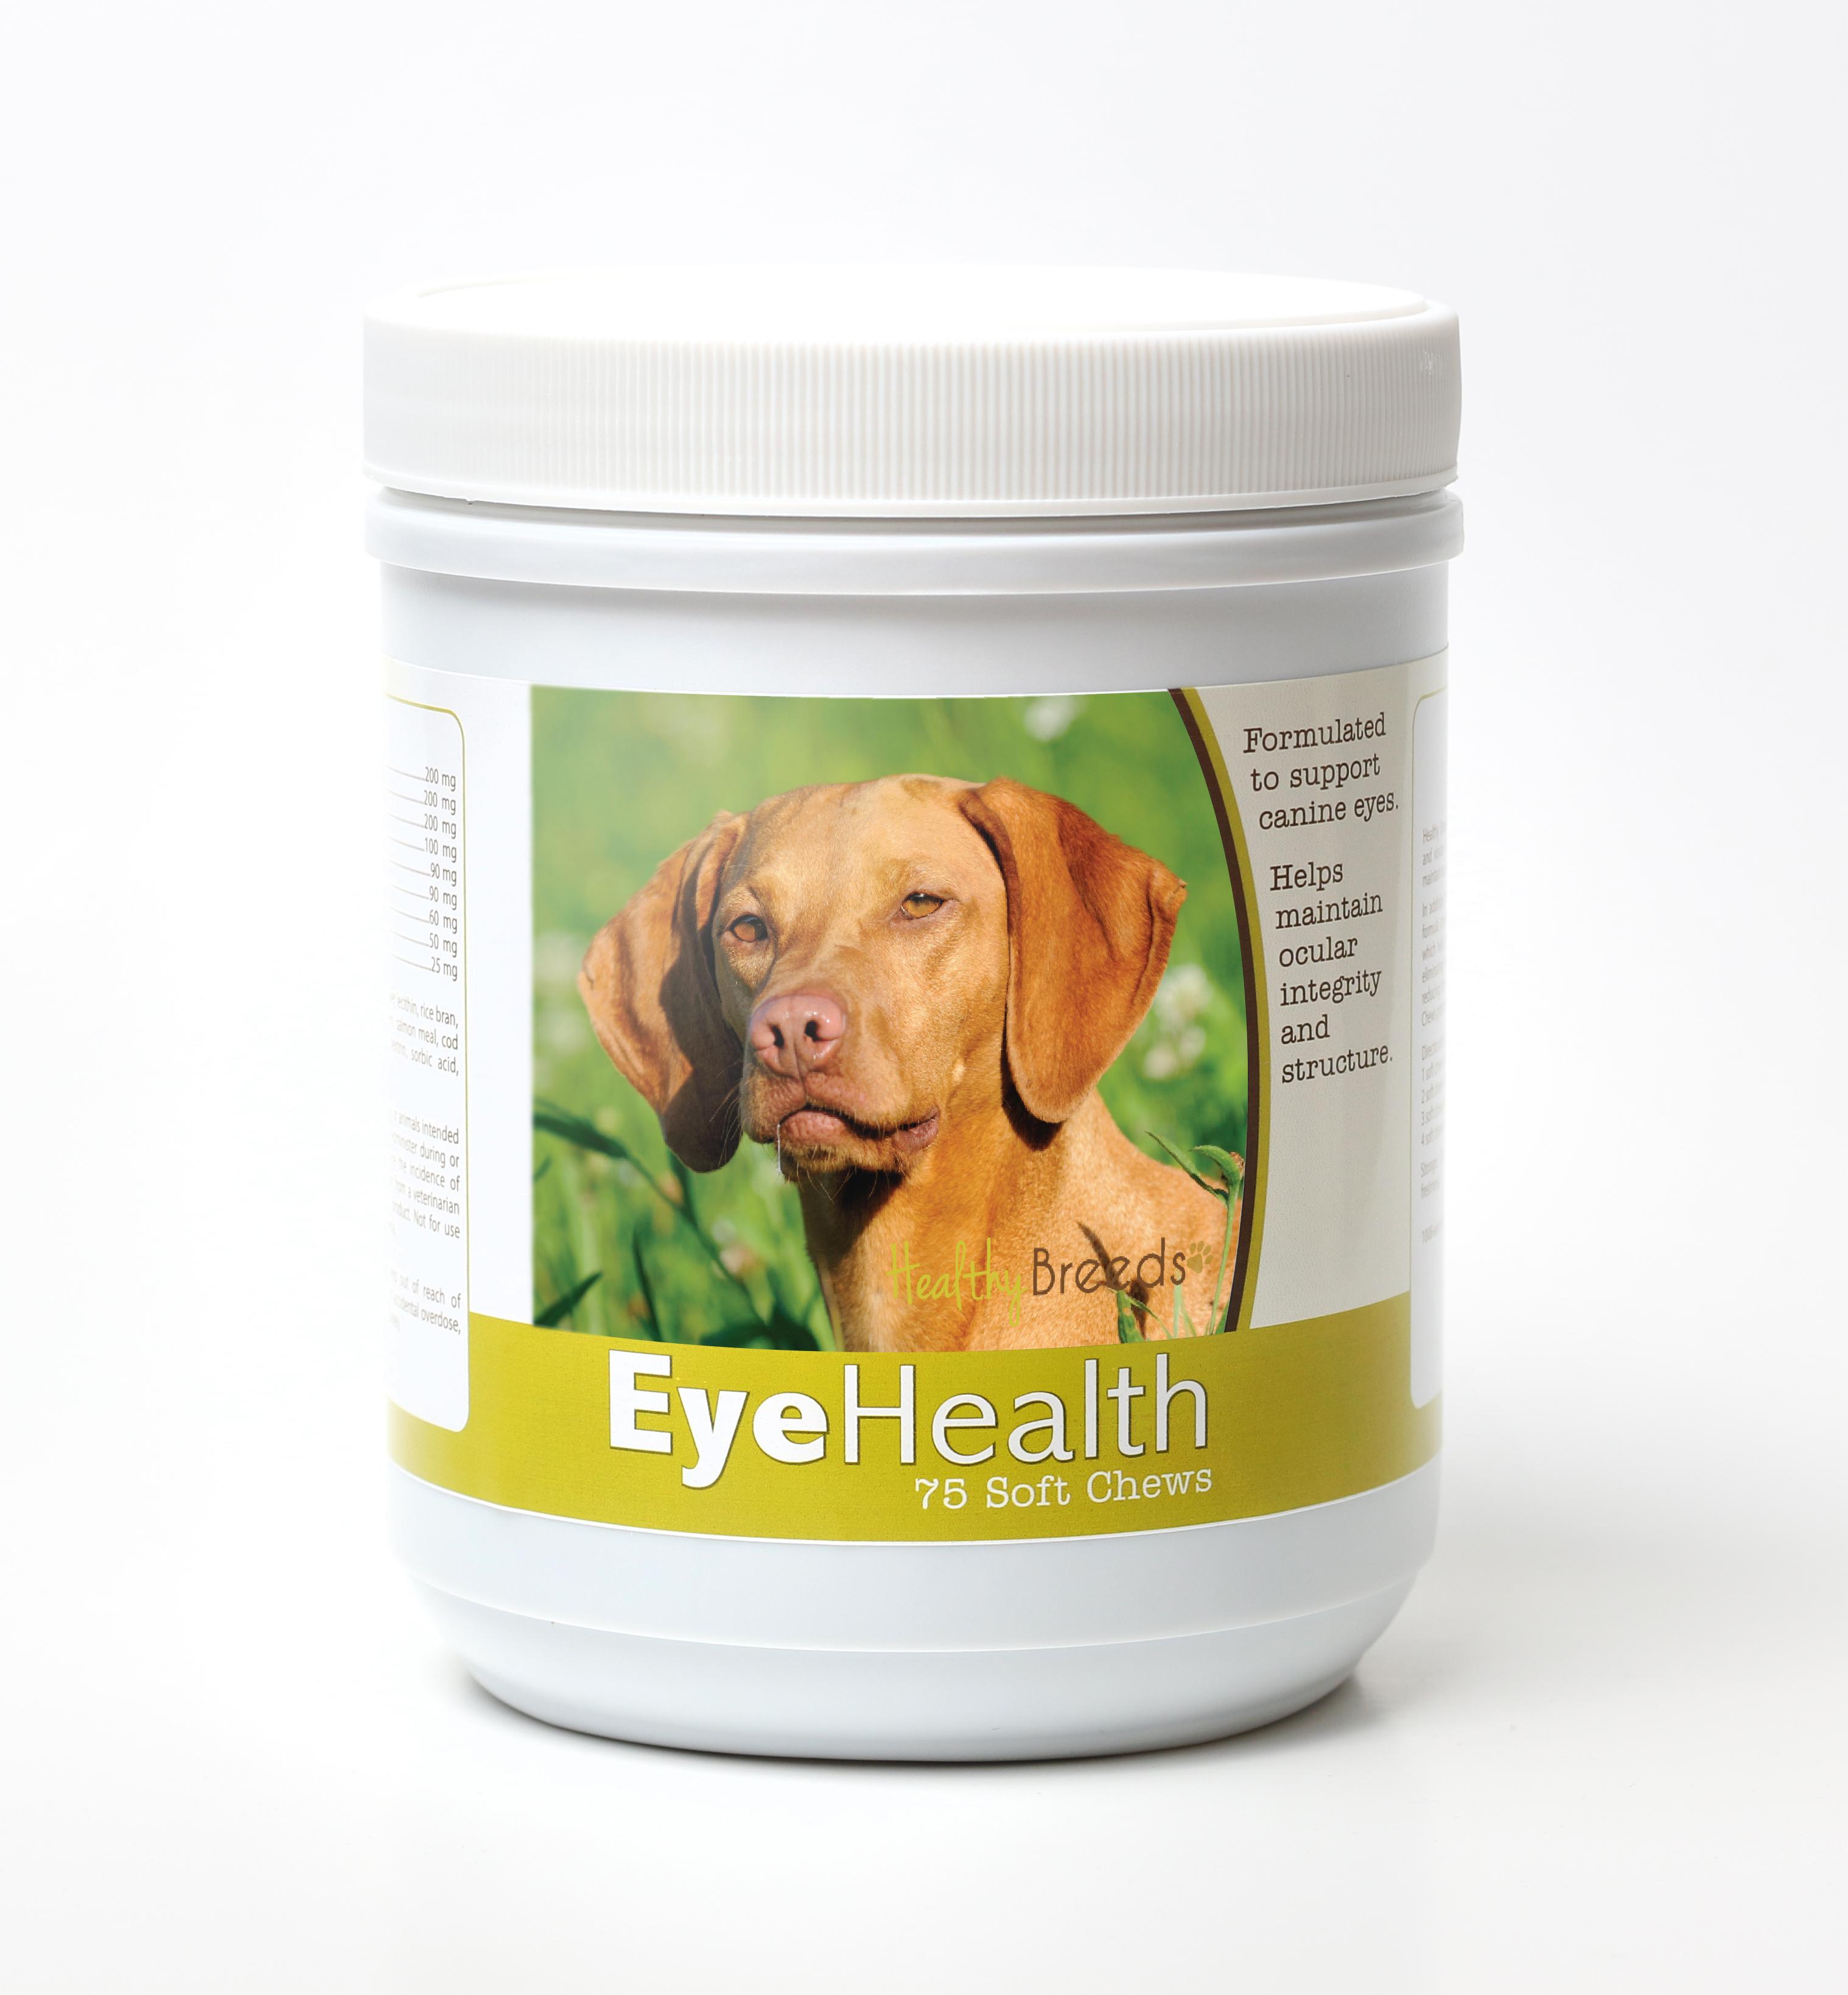 Healthy Breeds Dog Eye Health Support Soft Chews for Vizsla 75 Count